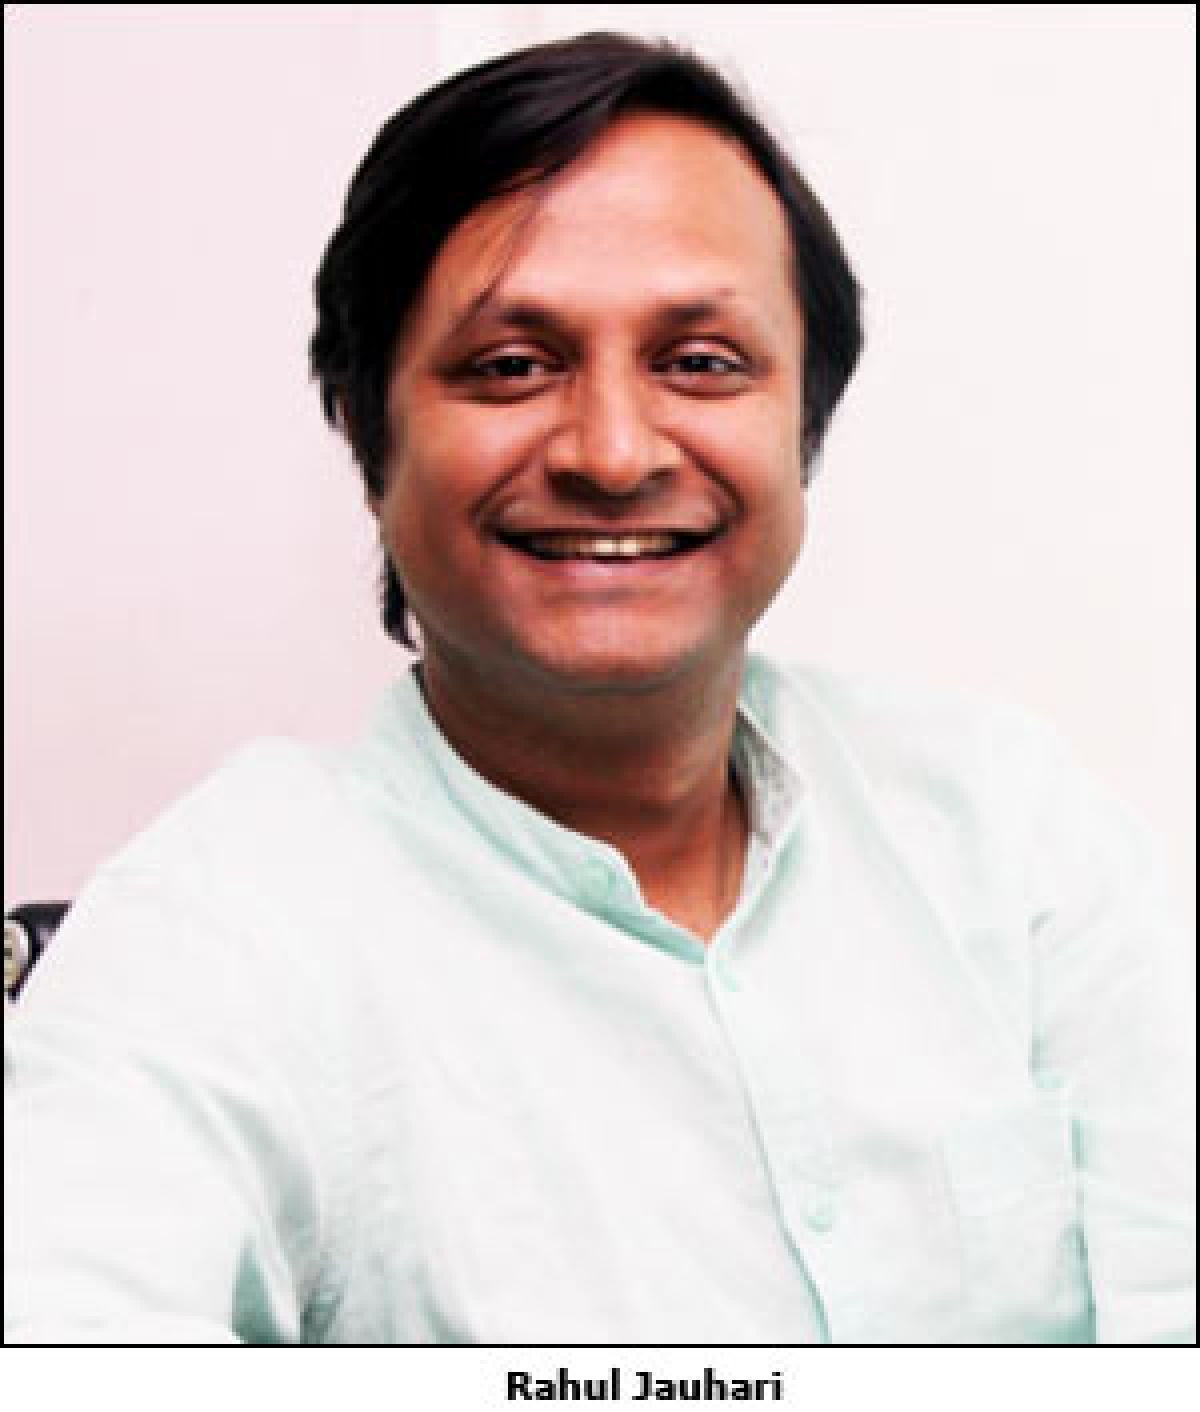 Rahul Jauhari: Always down-to-earth